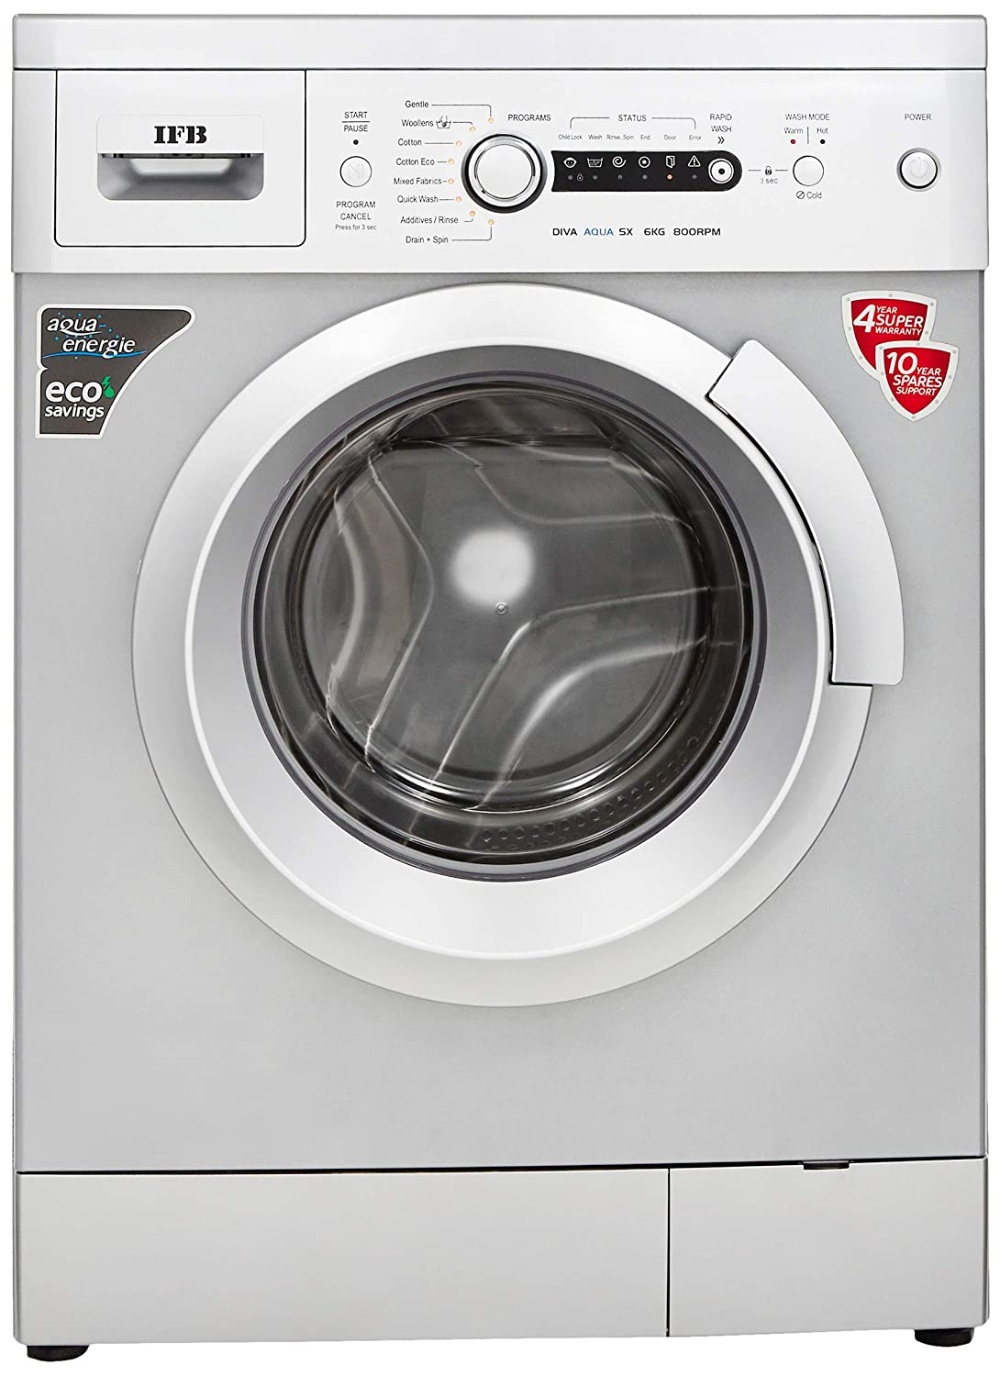 Washing Machines Washing Machine Front Loading Washing Machine Fully Automatic Washing Machine